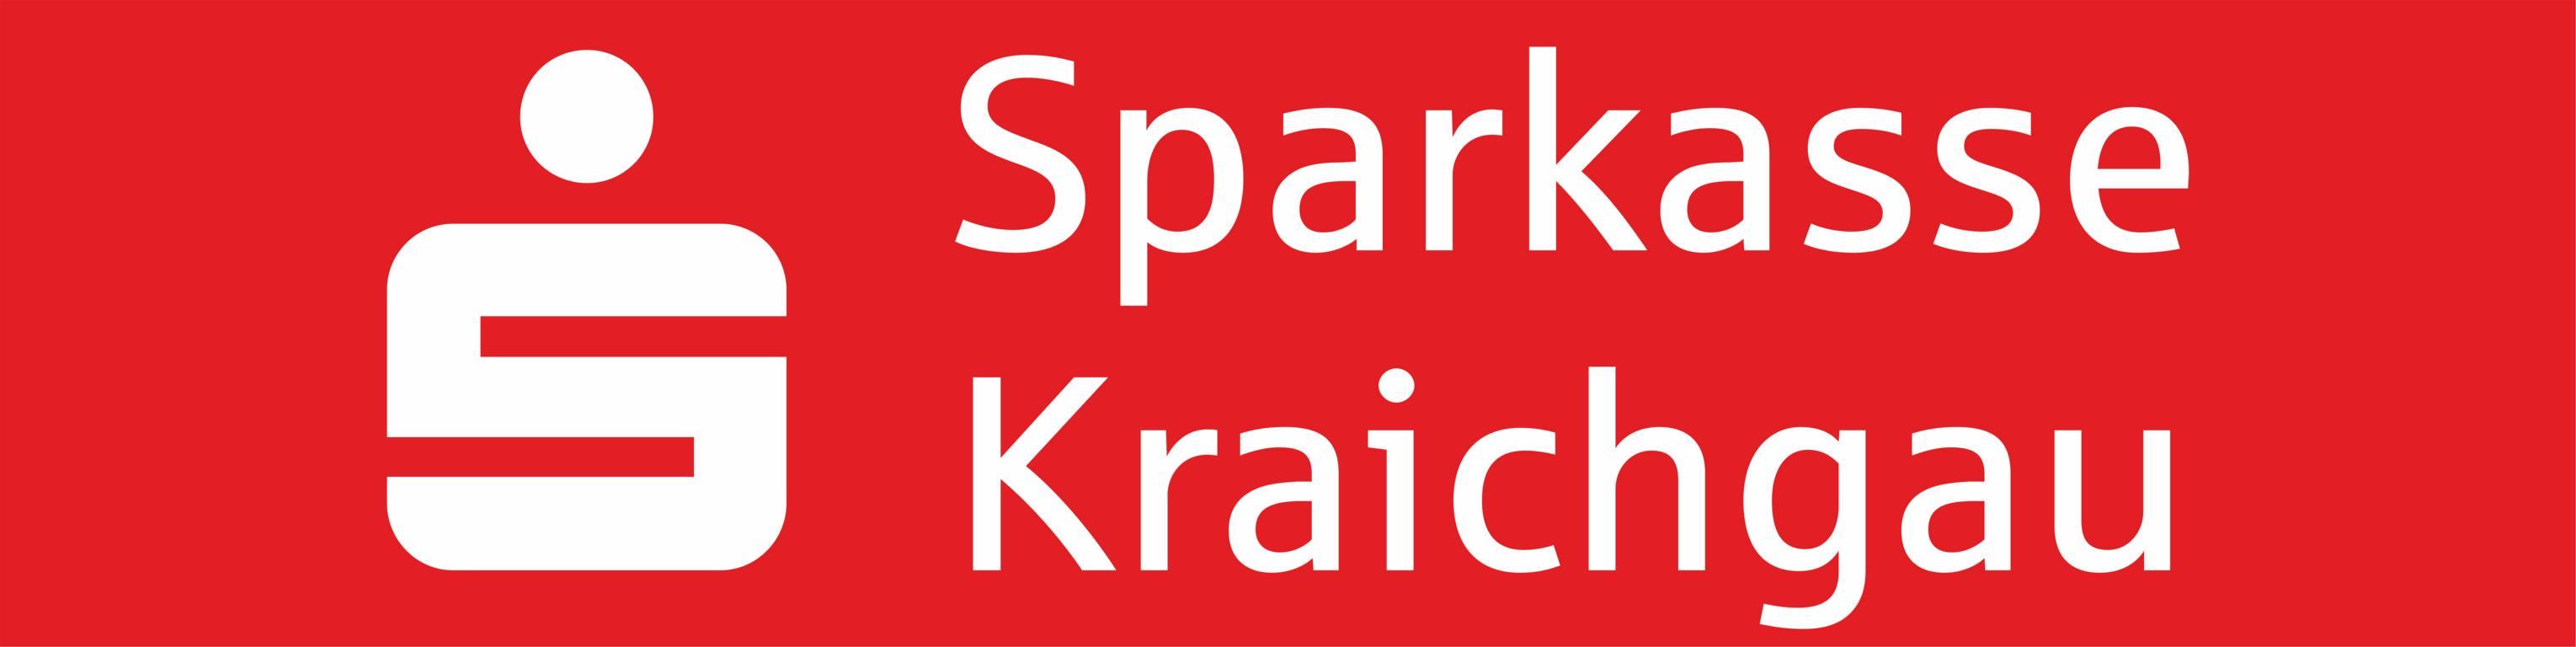 Sparkasse Kraichgau